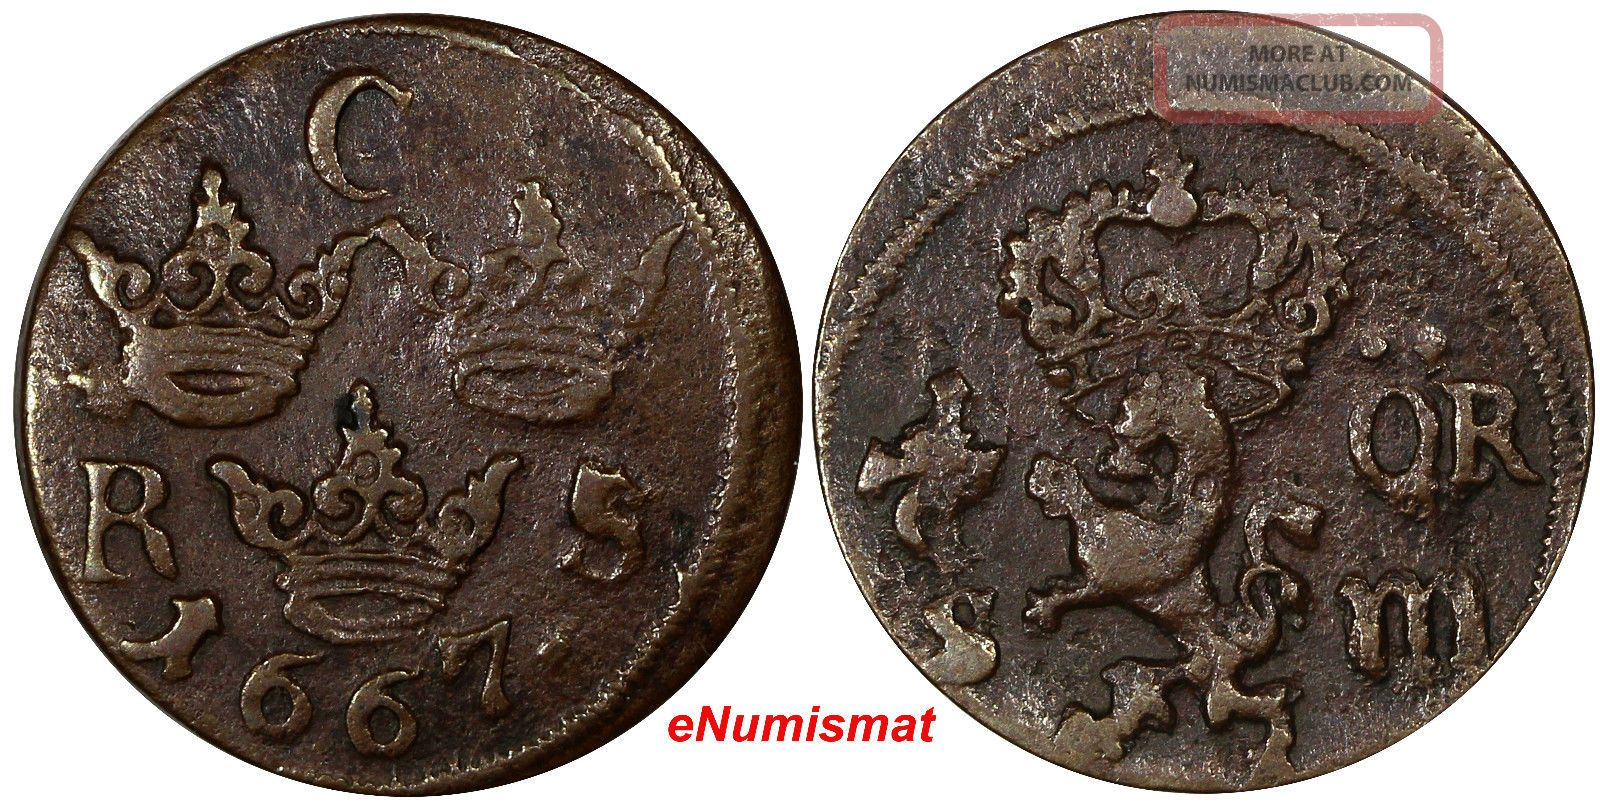 Sweden Karl Xi (1660 - 1697) Copper 1667 S.  M.  1/6 Ore,  Vf Cond Off Center Km 254 Europe photo